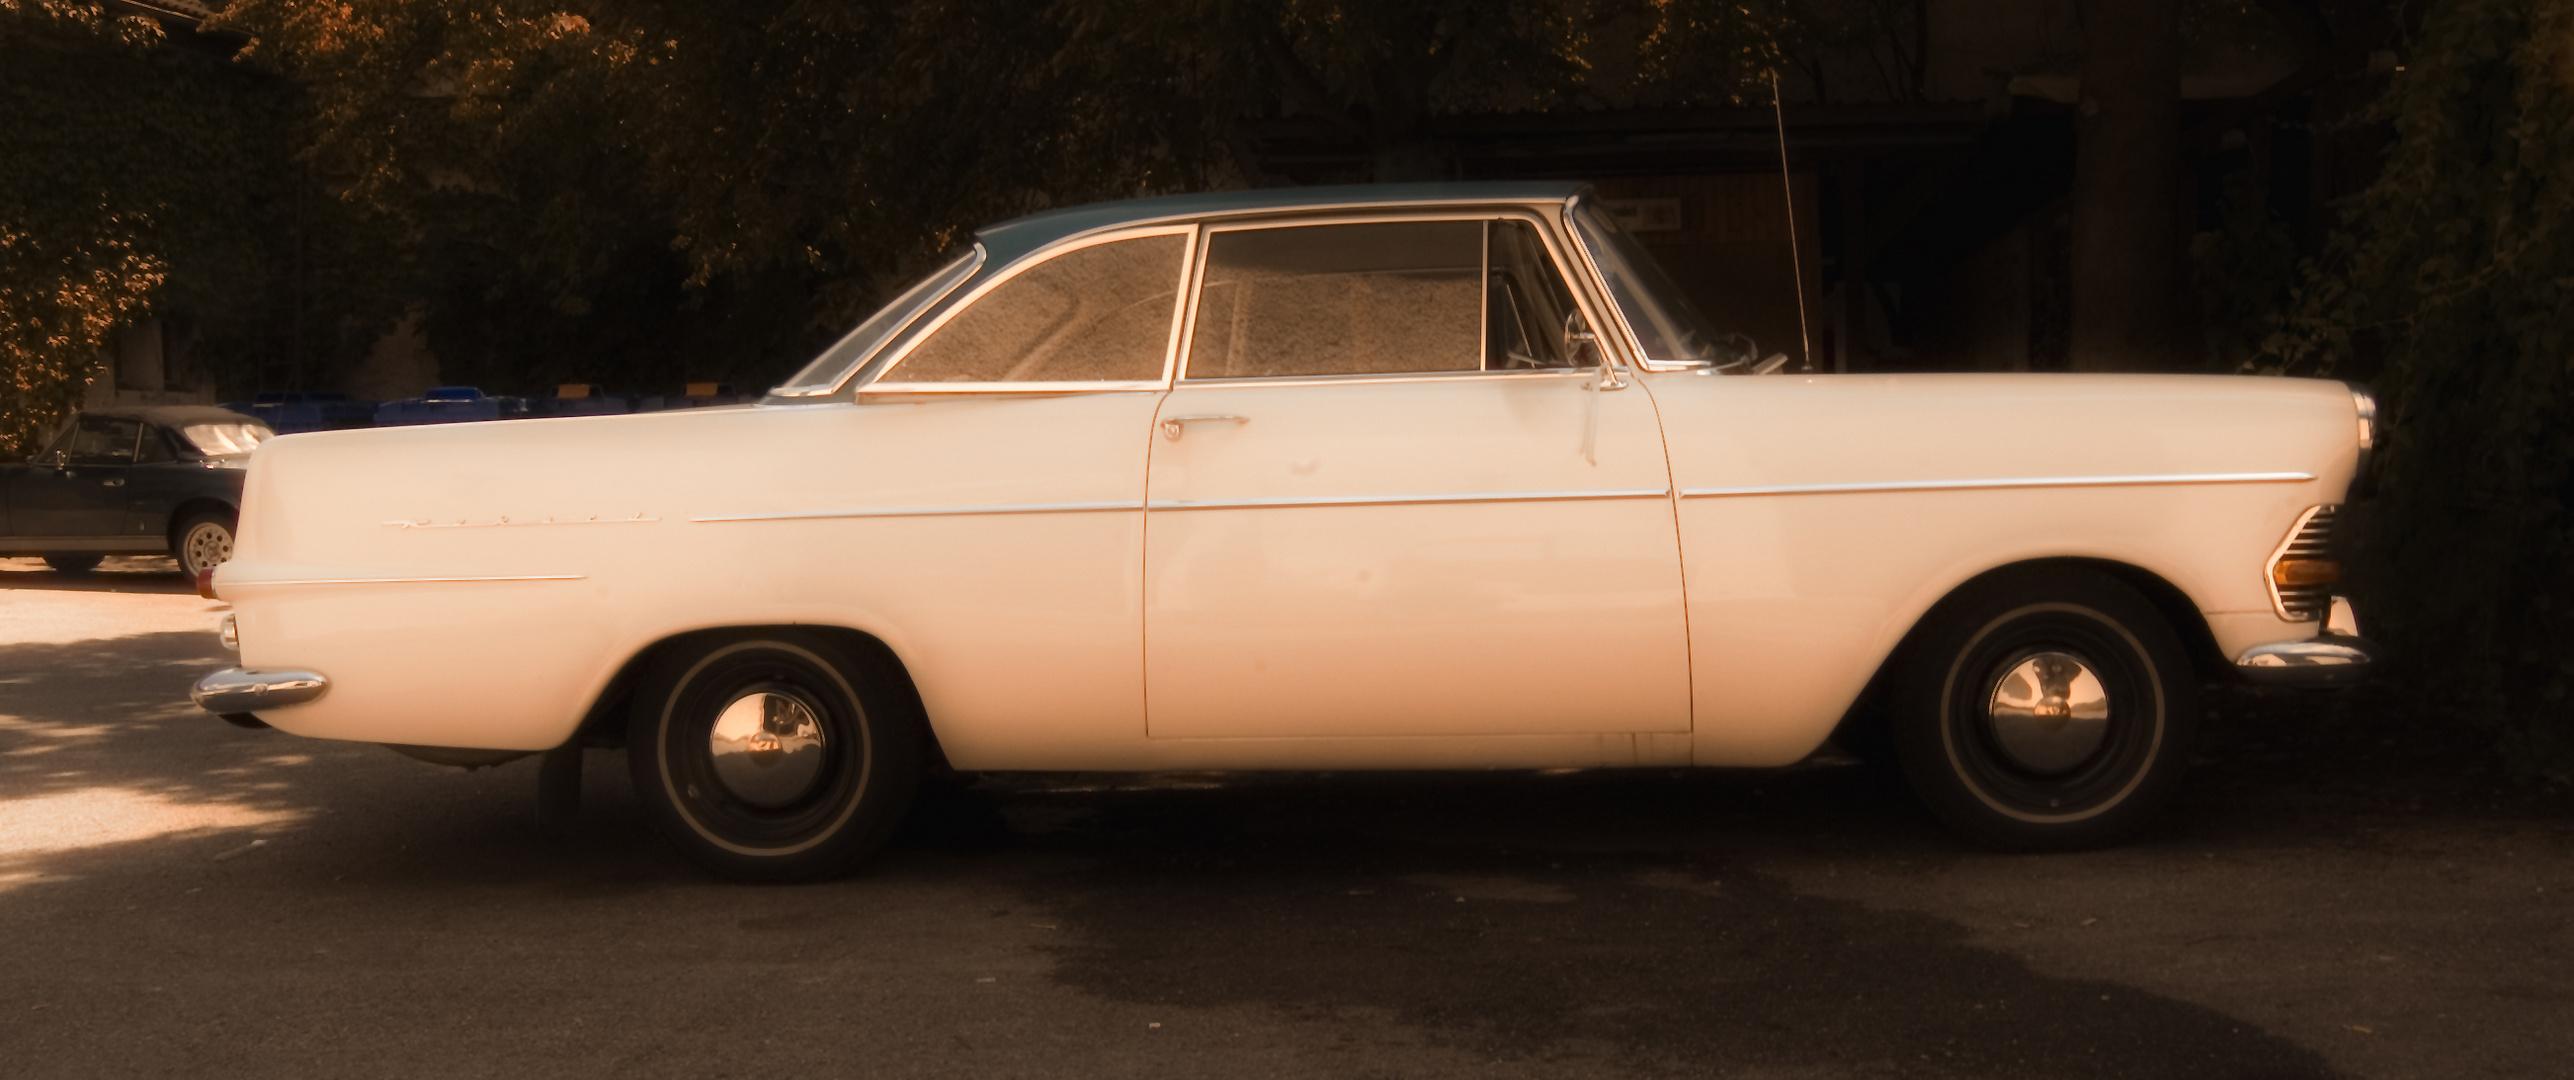 Opel Rekord Coupé IV.